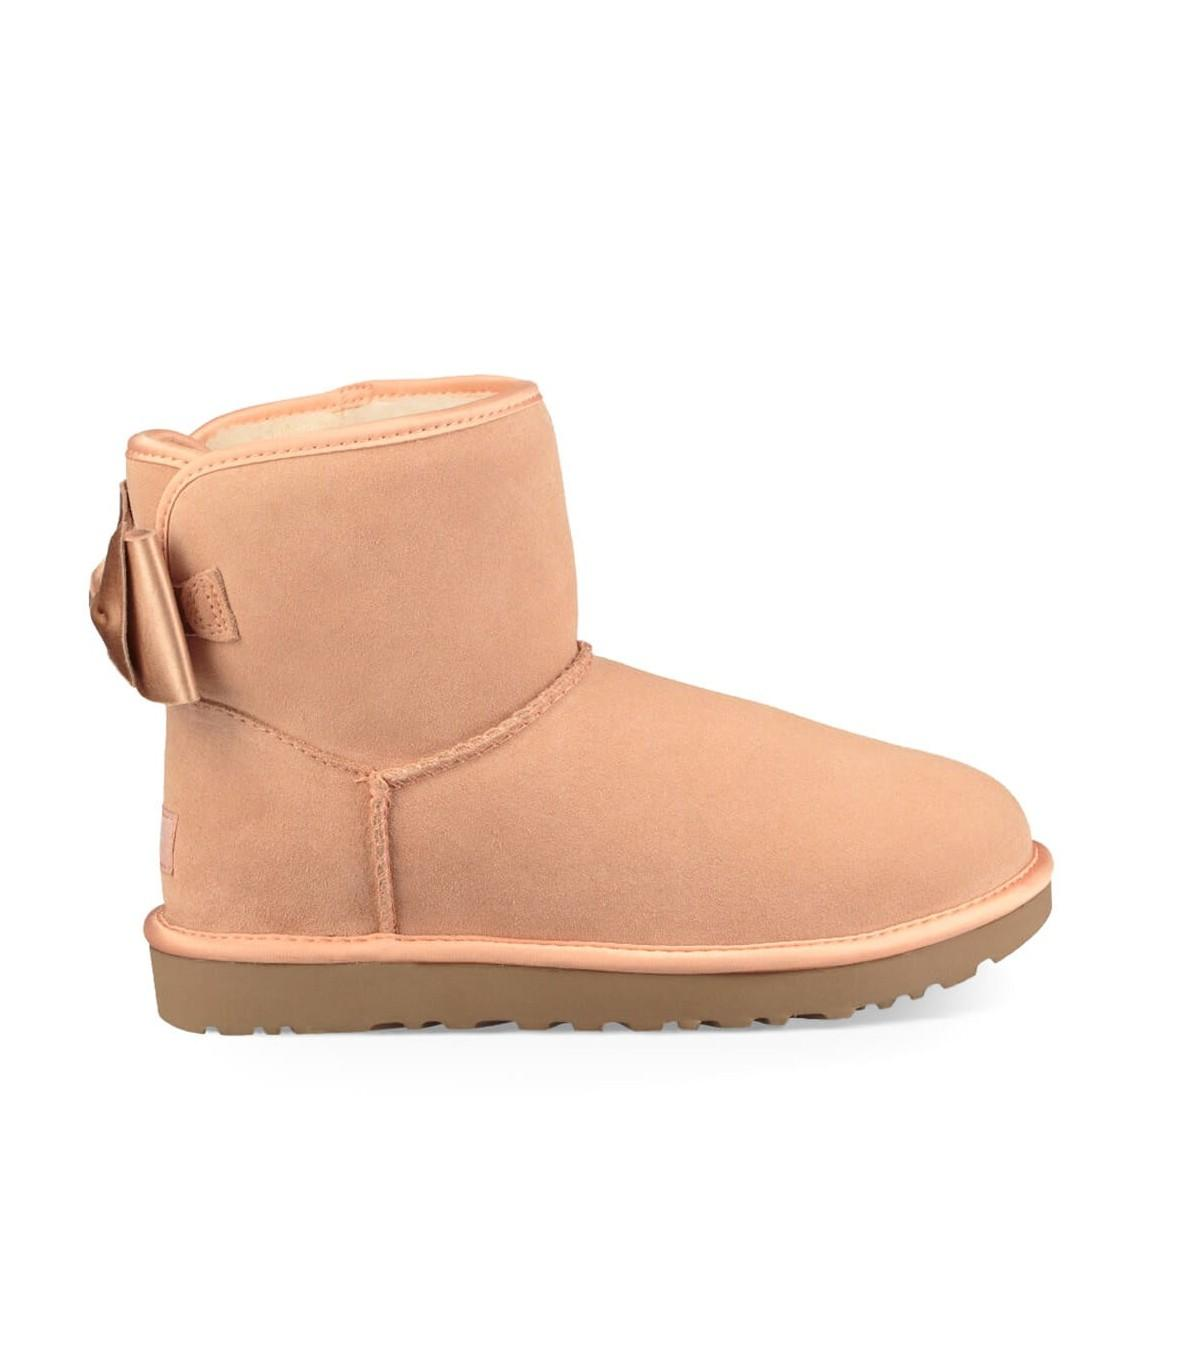 UGG Light Pink Satin Bow Mini Boot - Lyst